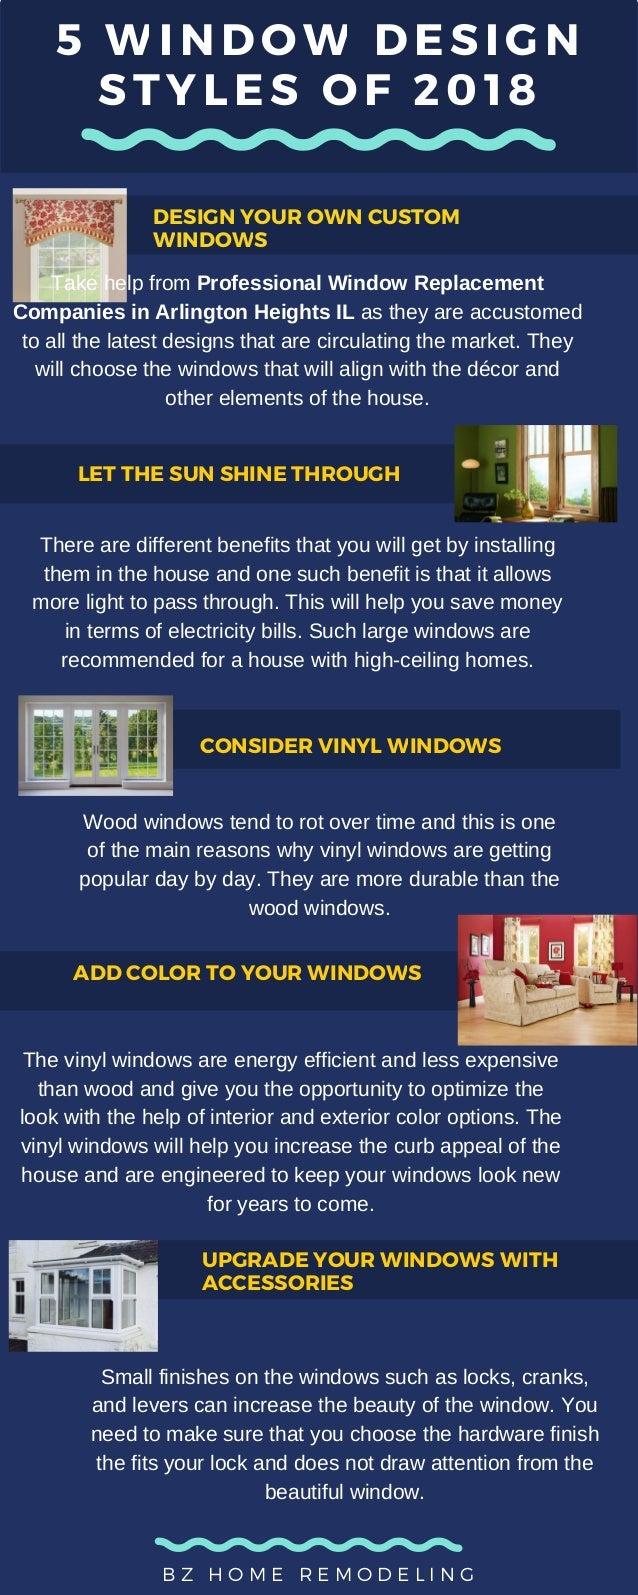 5 window design styles of 2018